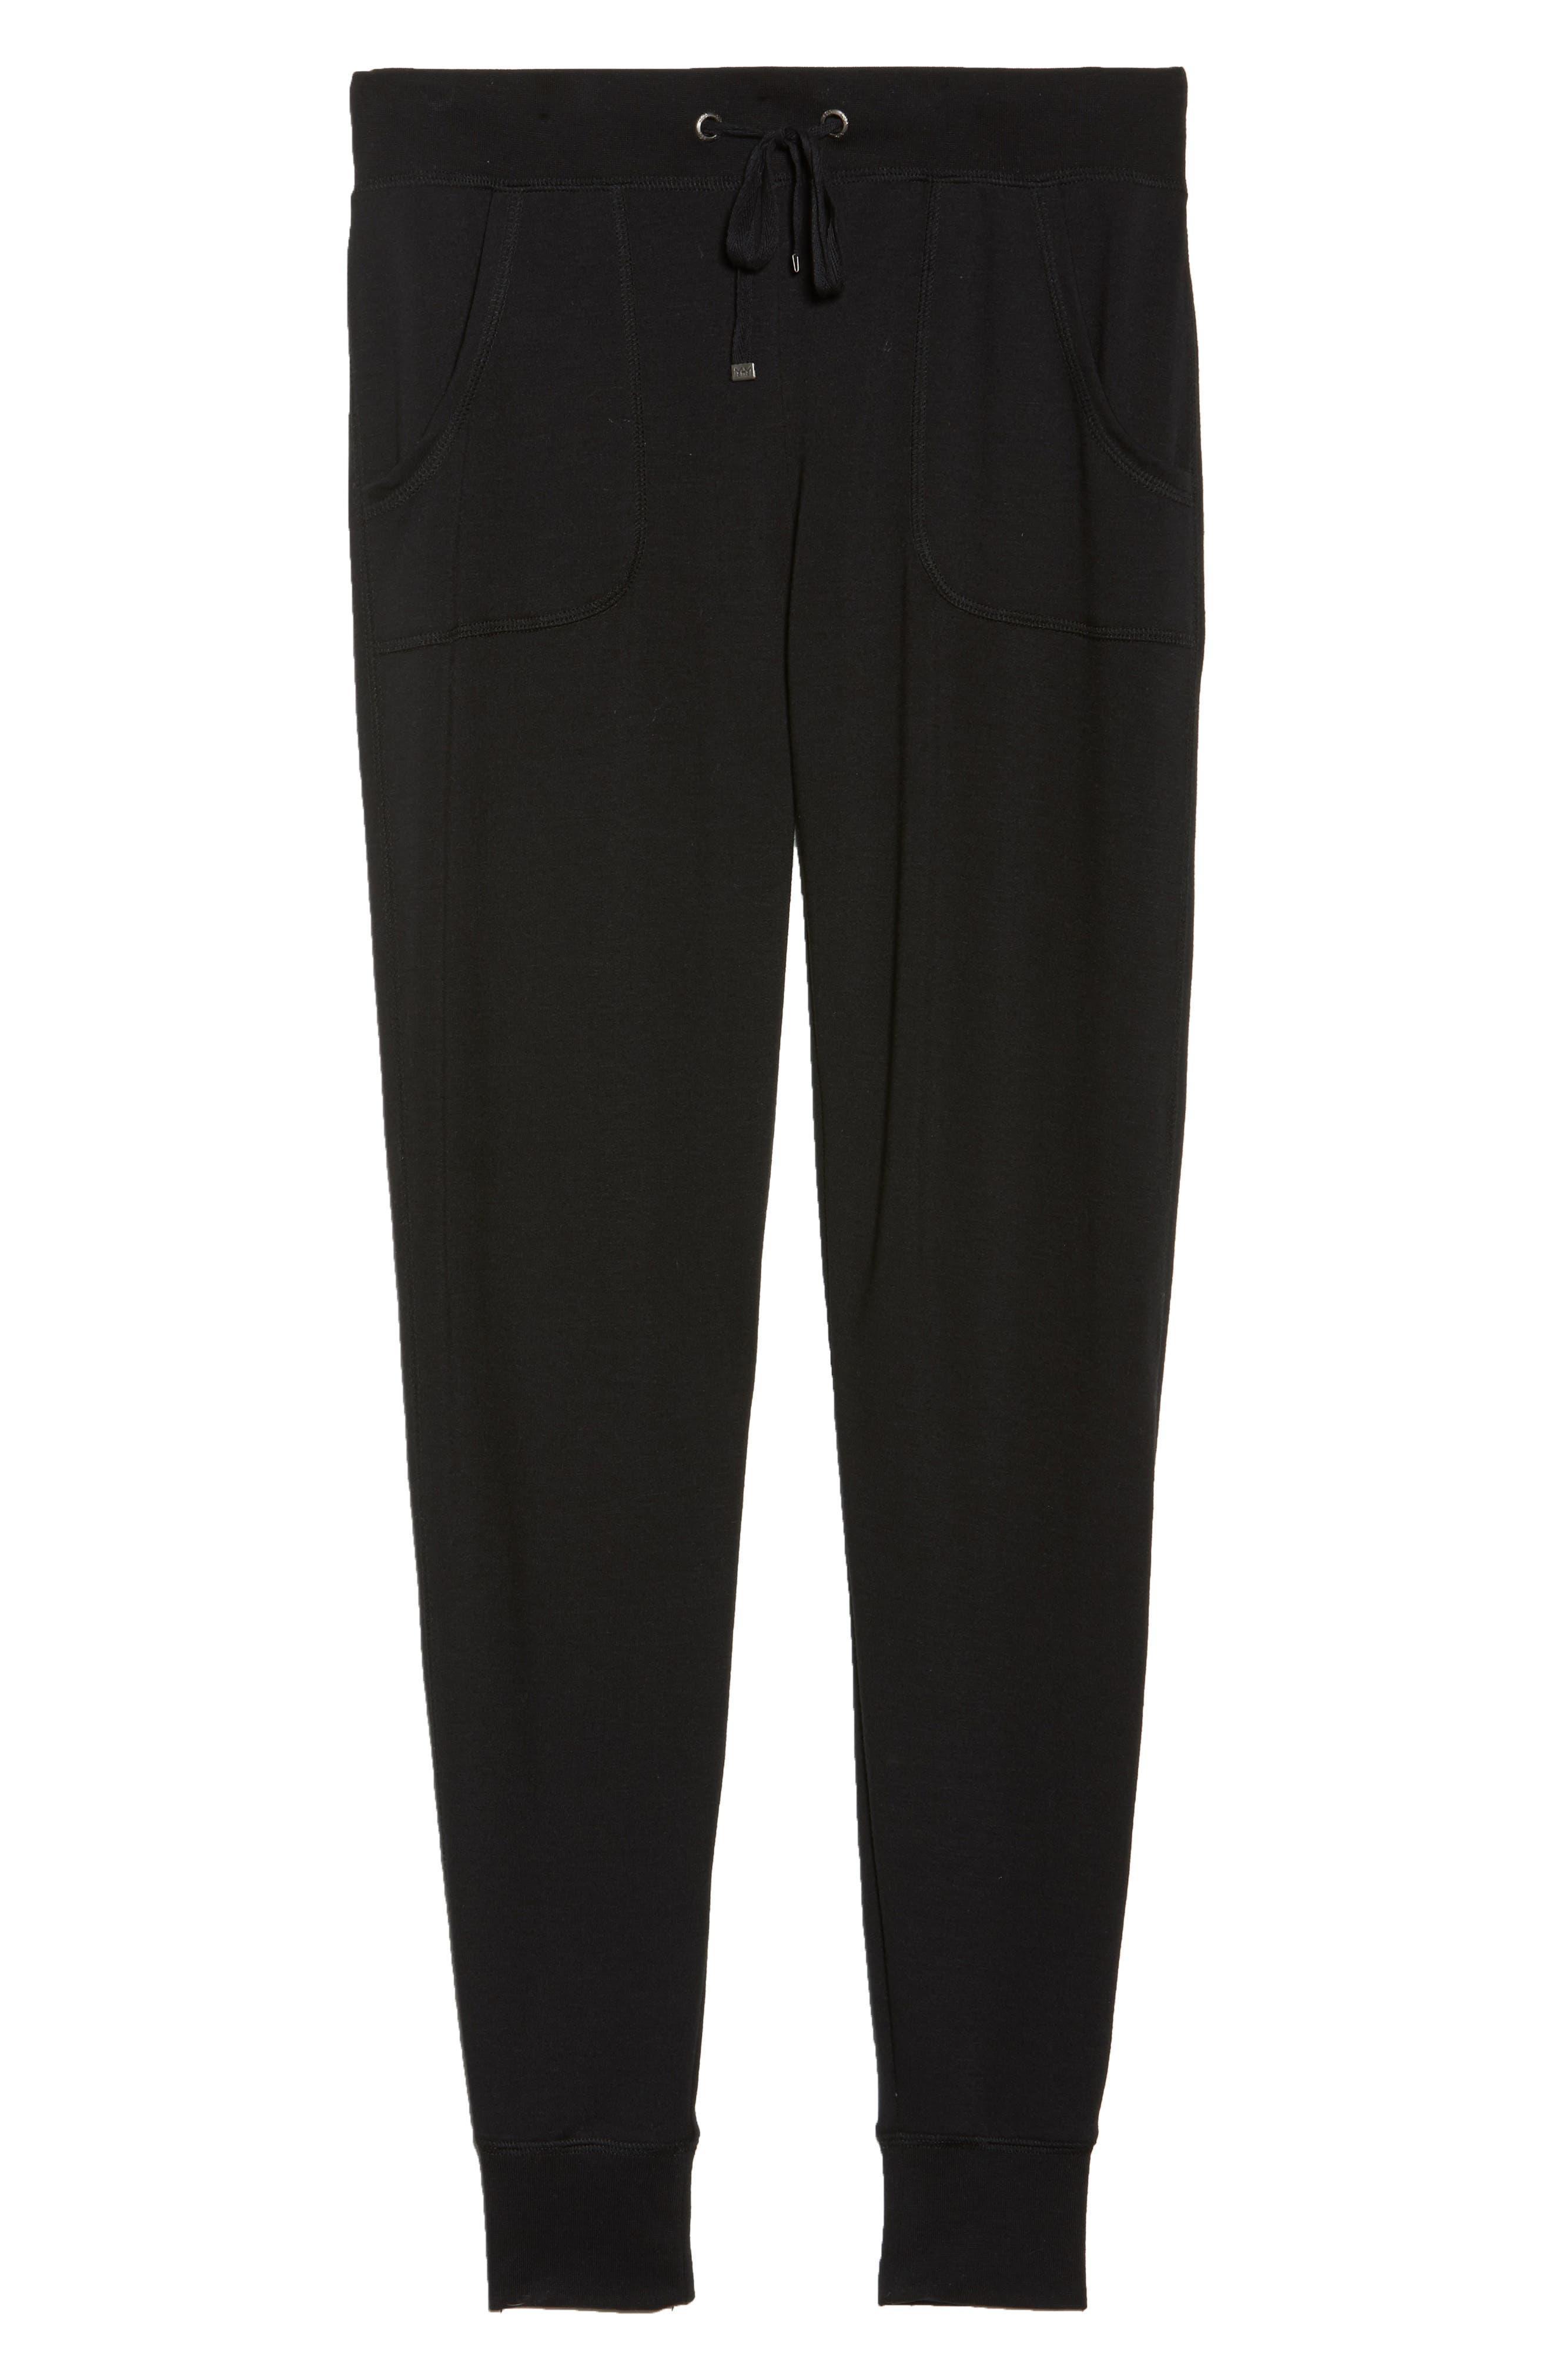 Main Image - Make + Model All About It Lounge Pants